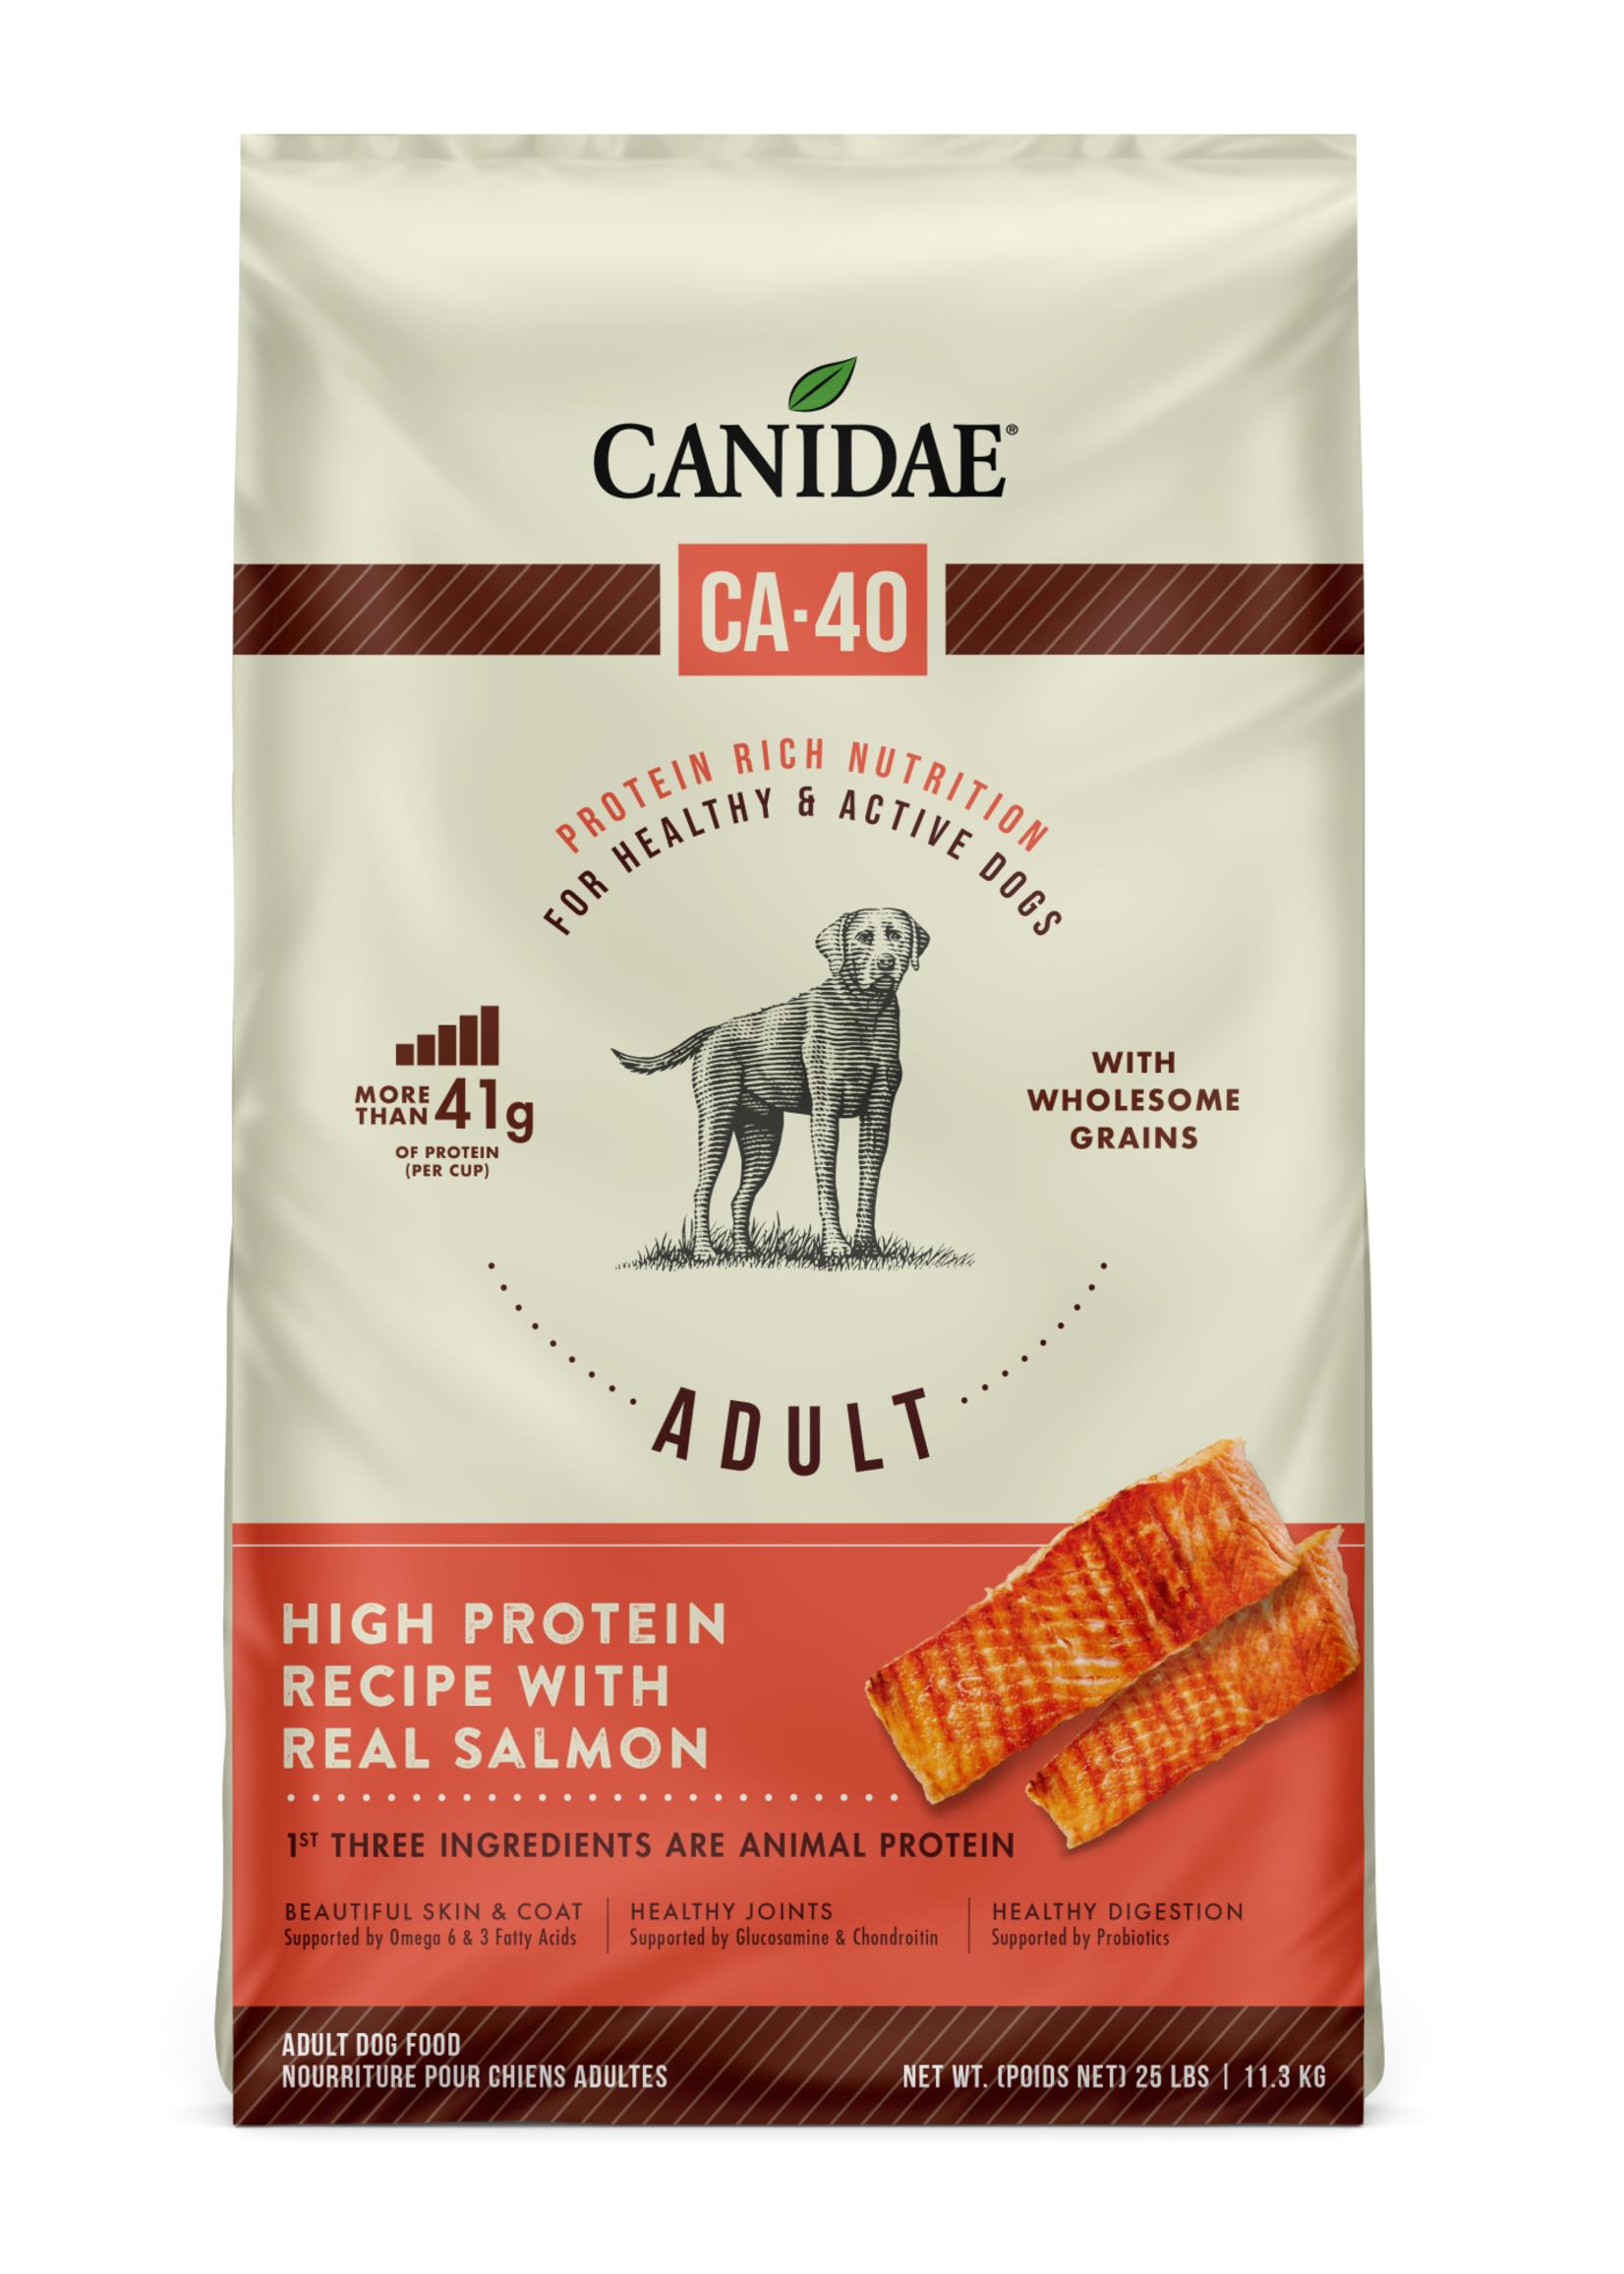 Canidae Canidae CA-40 High Protein Salmon 7 lb